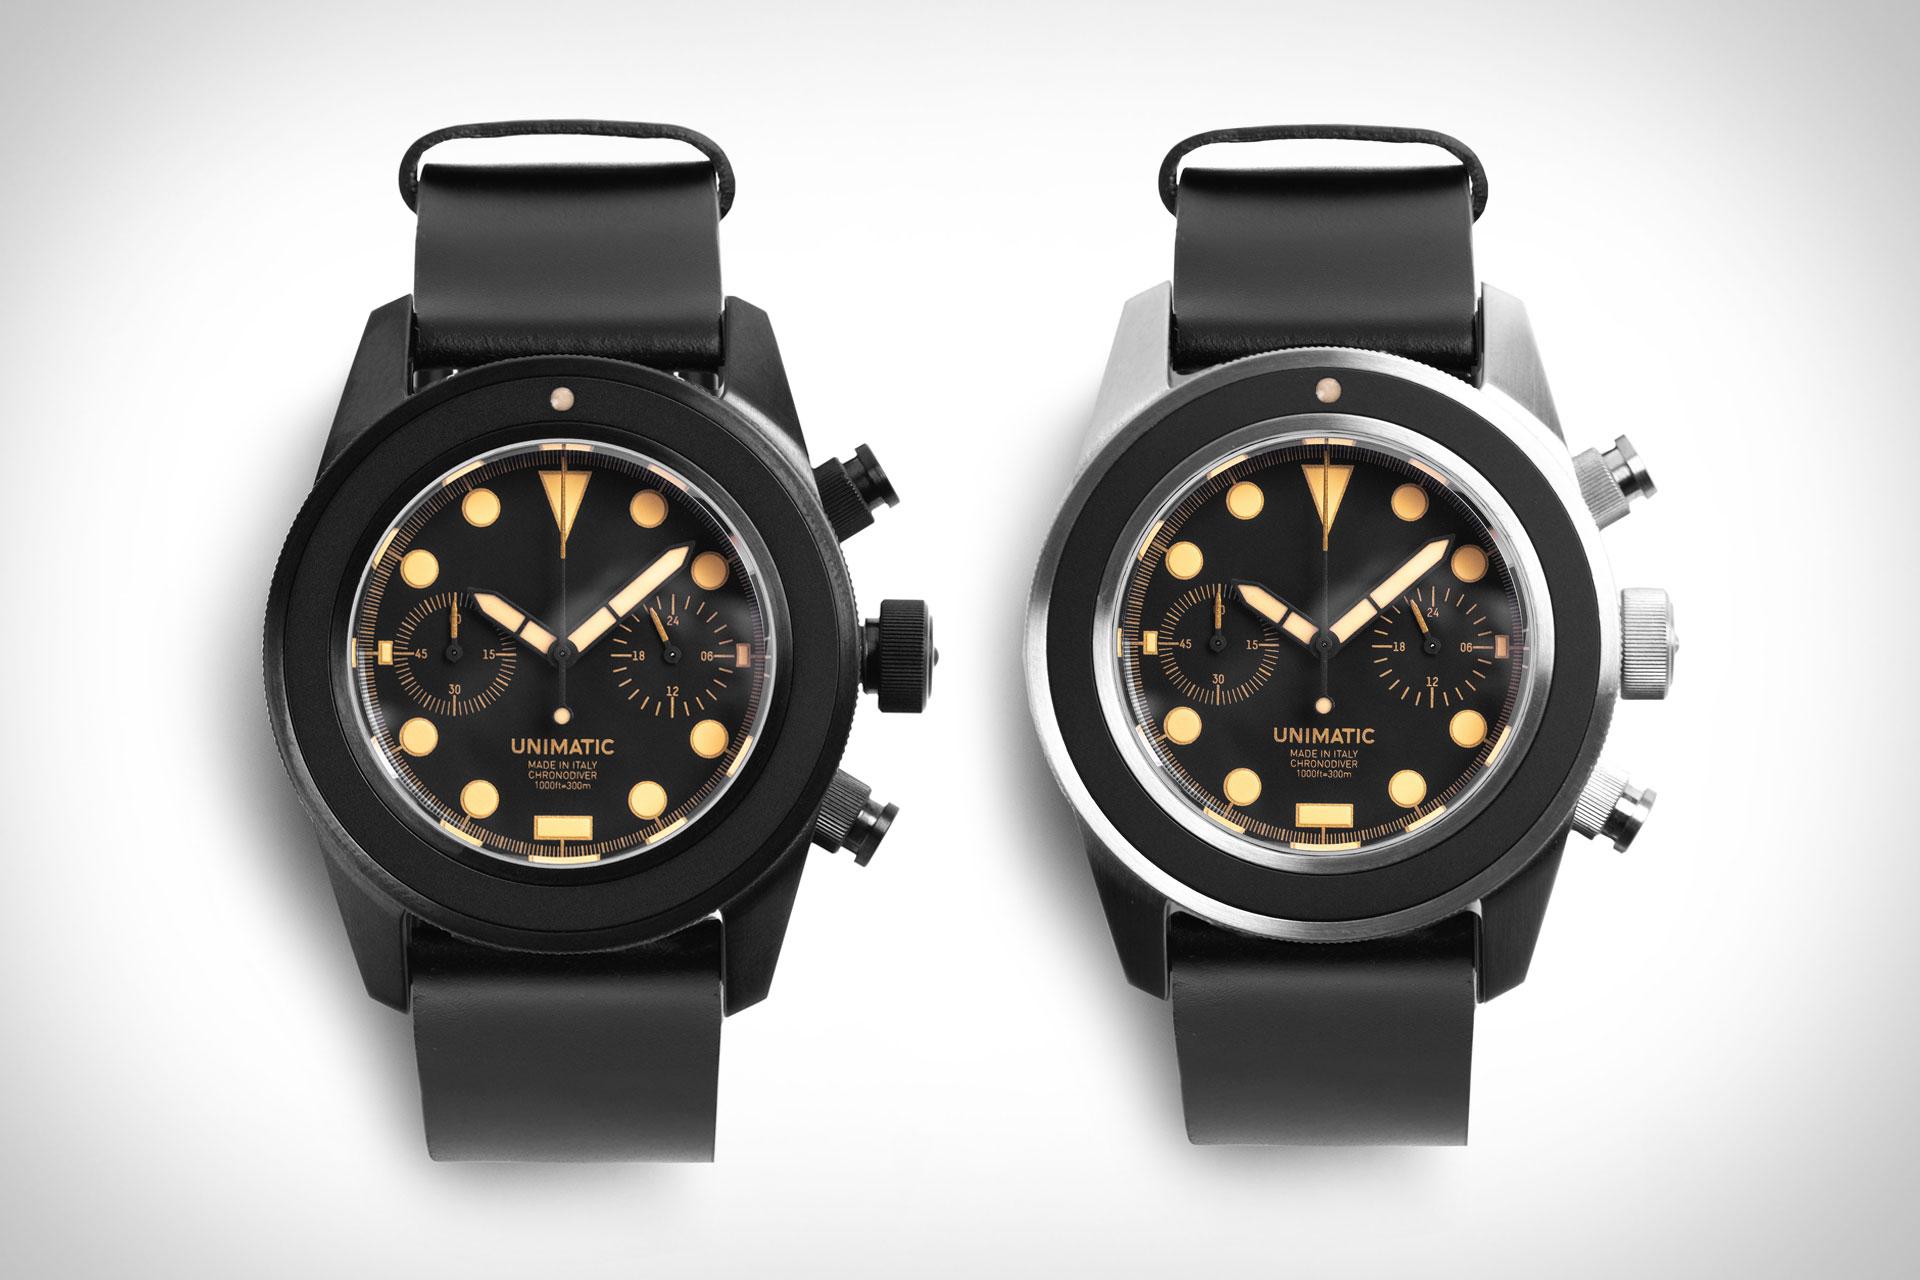 Unimatic U3 Chronograph Watch